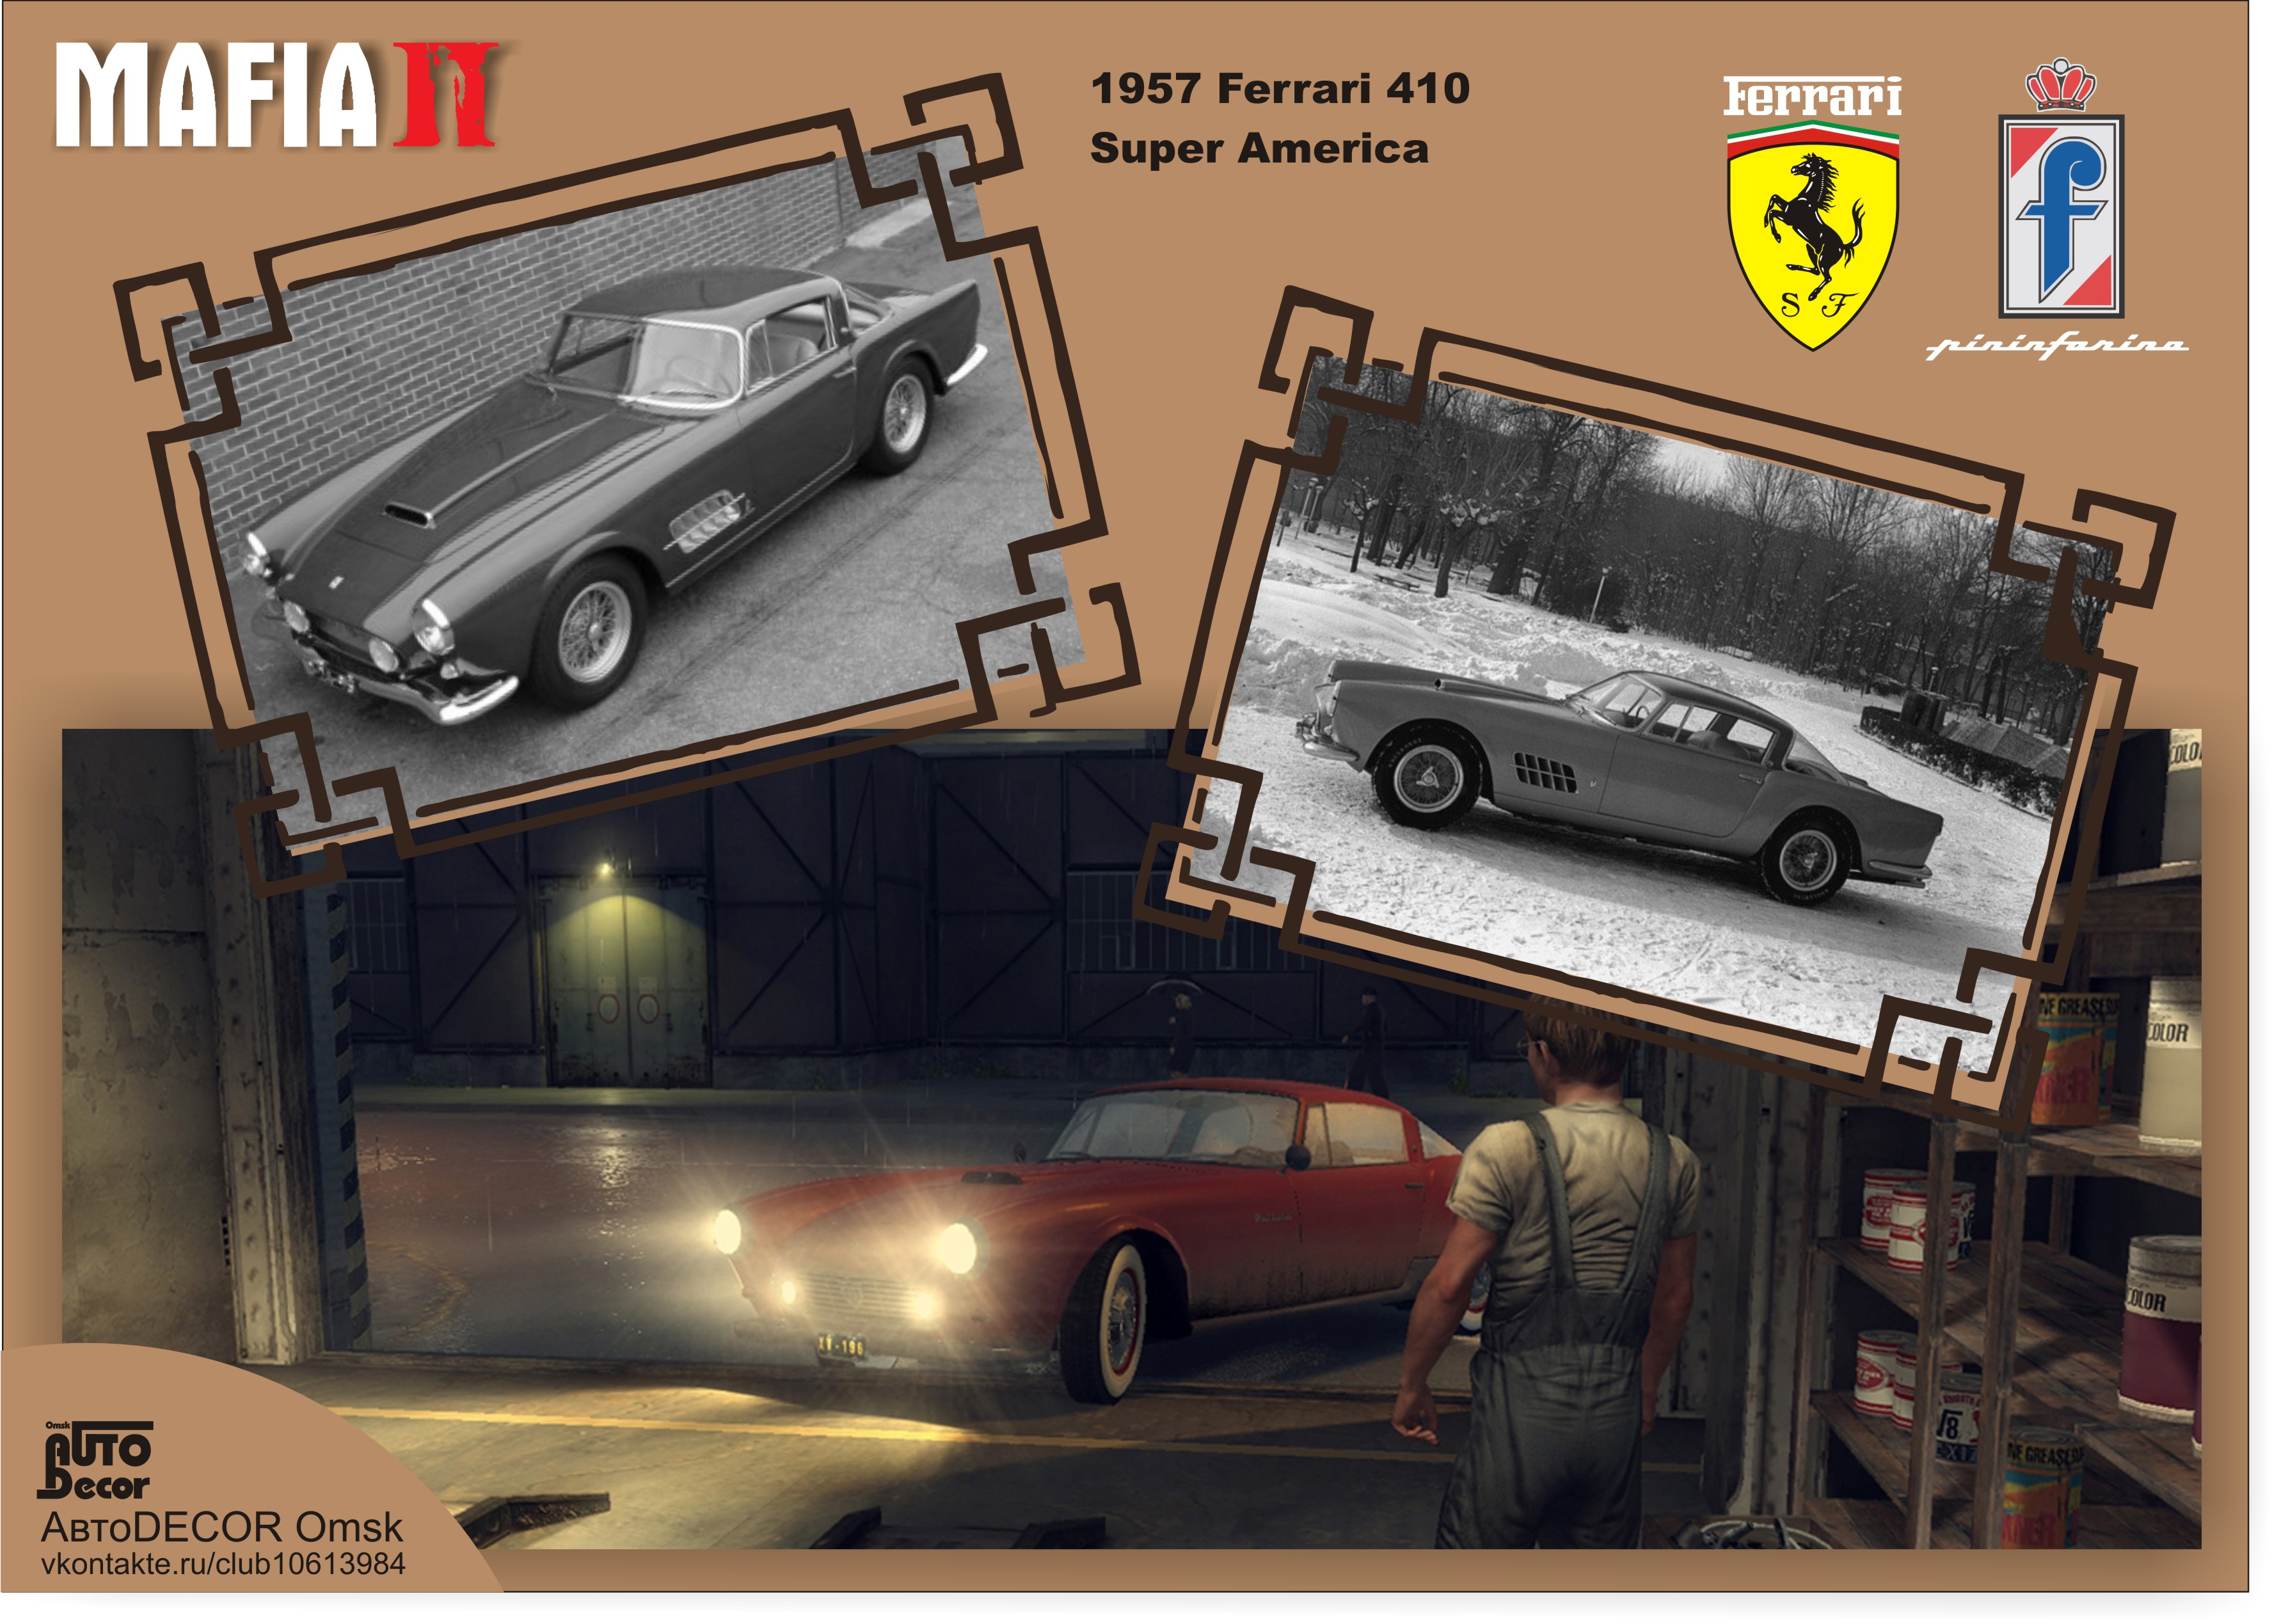 1957 Ferrari 410 Super America - Mafia 2